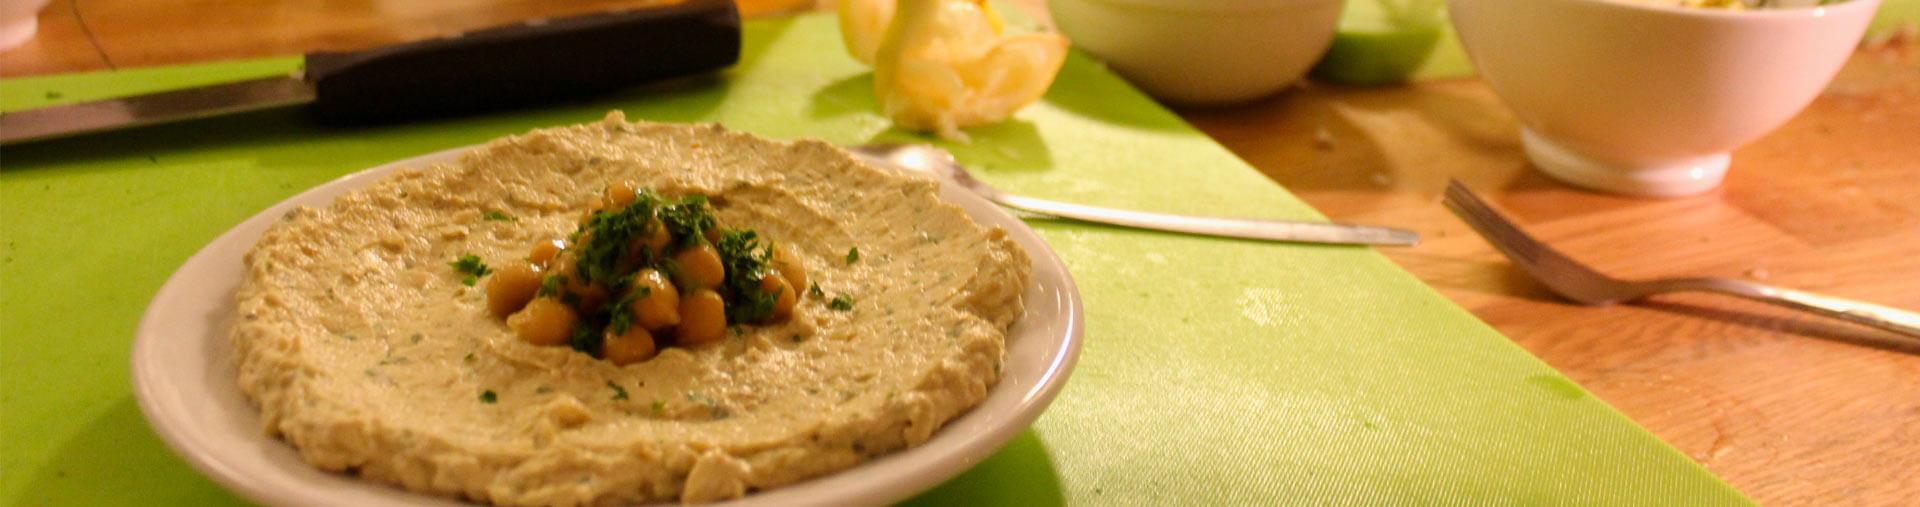 learn to make hummus